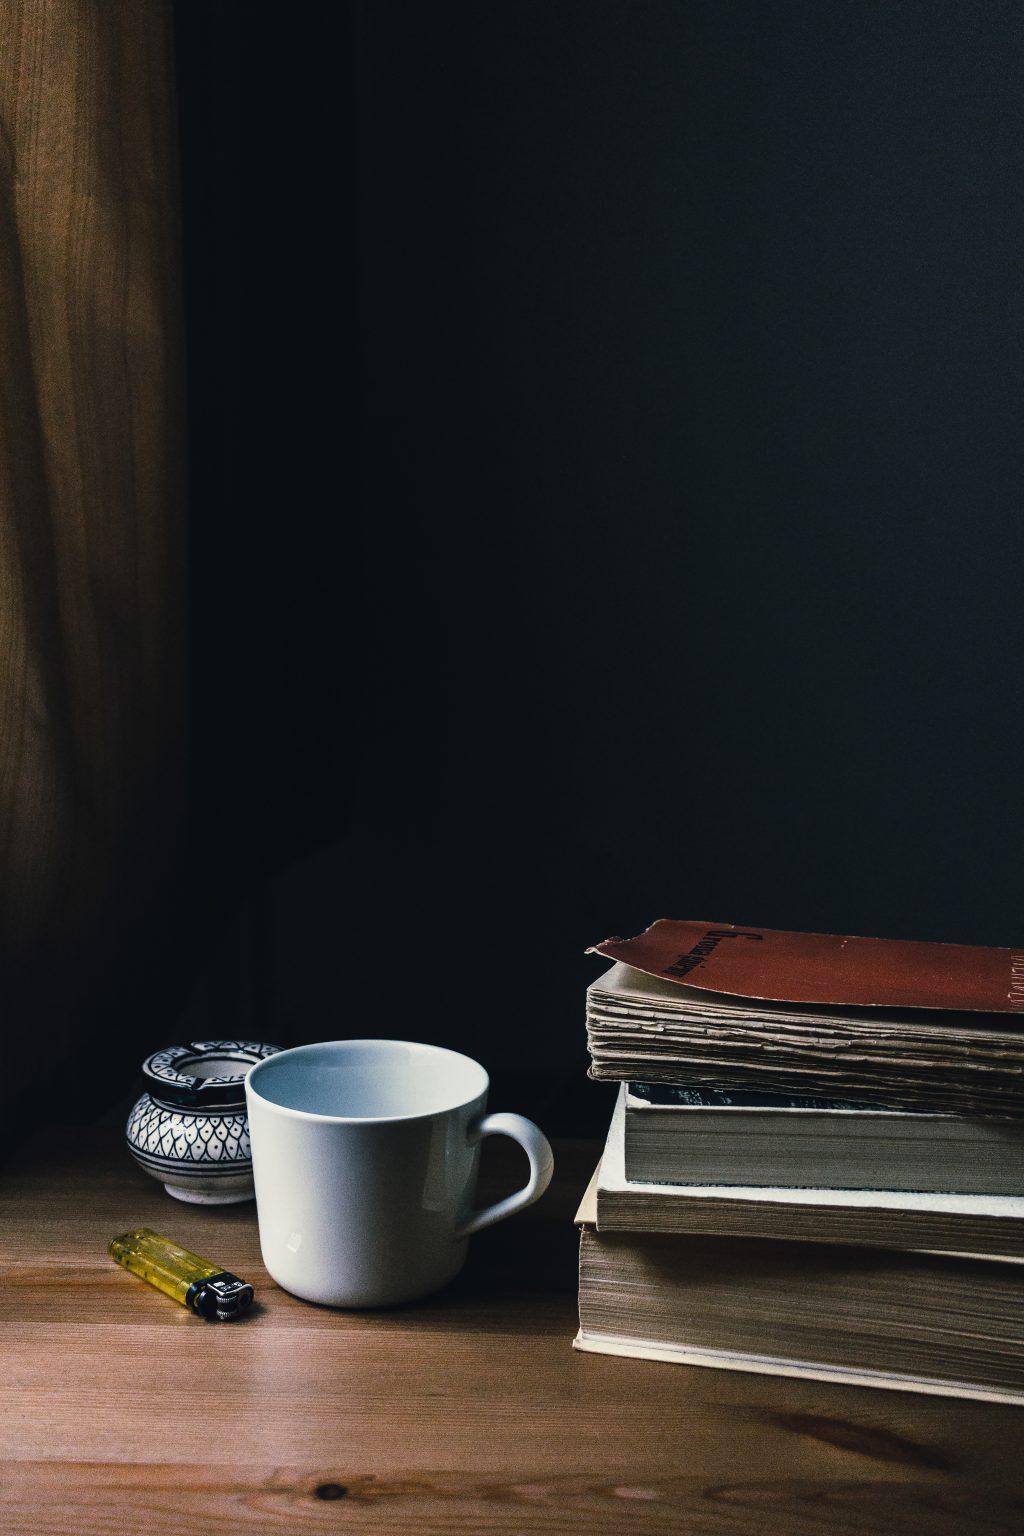 Tea mug, a lighter and a pile of books - free stock photo